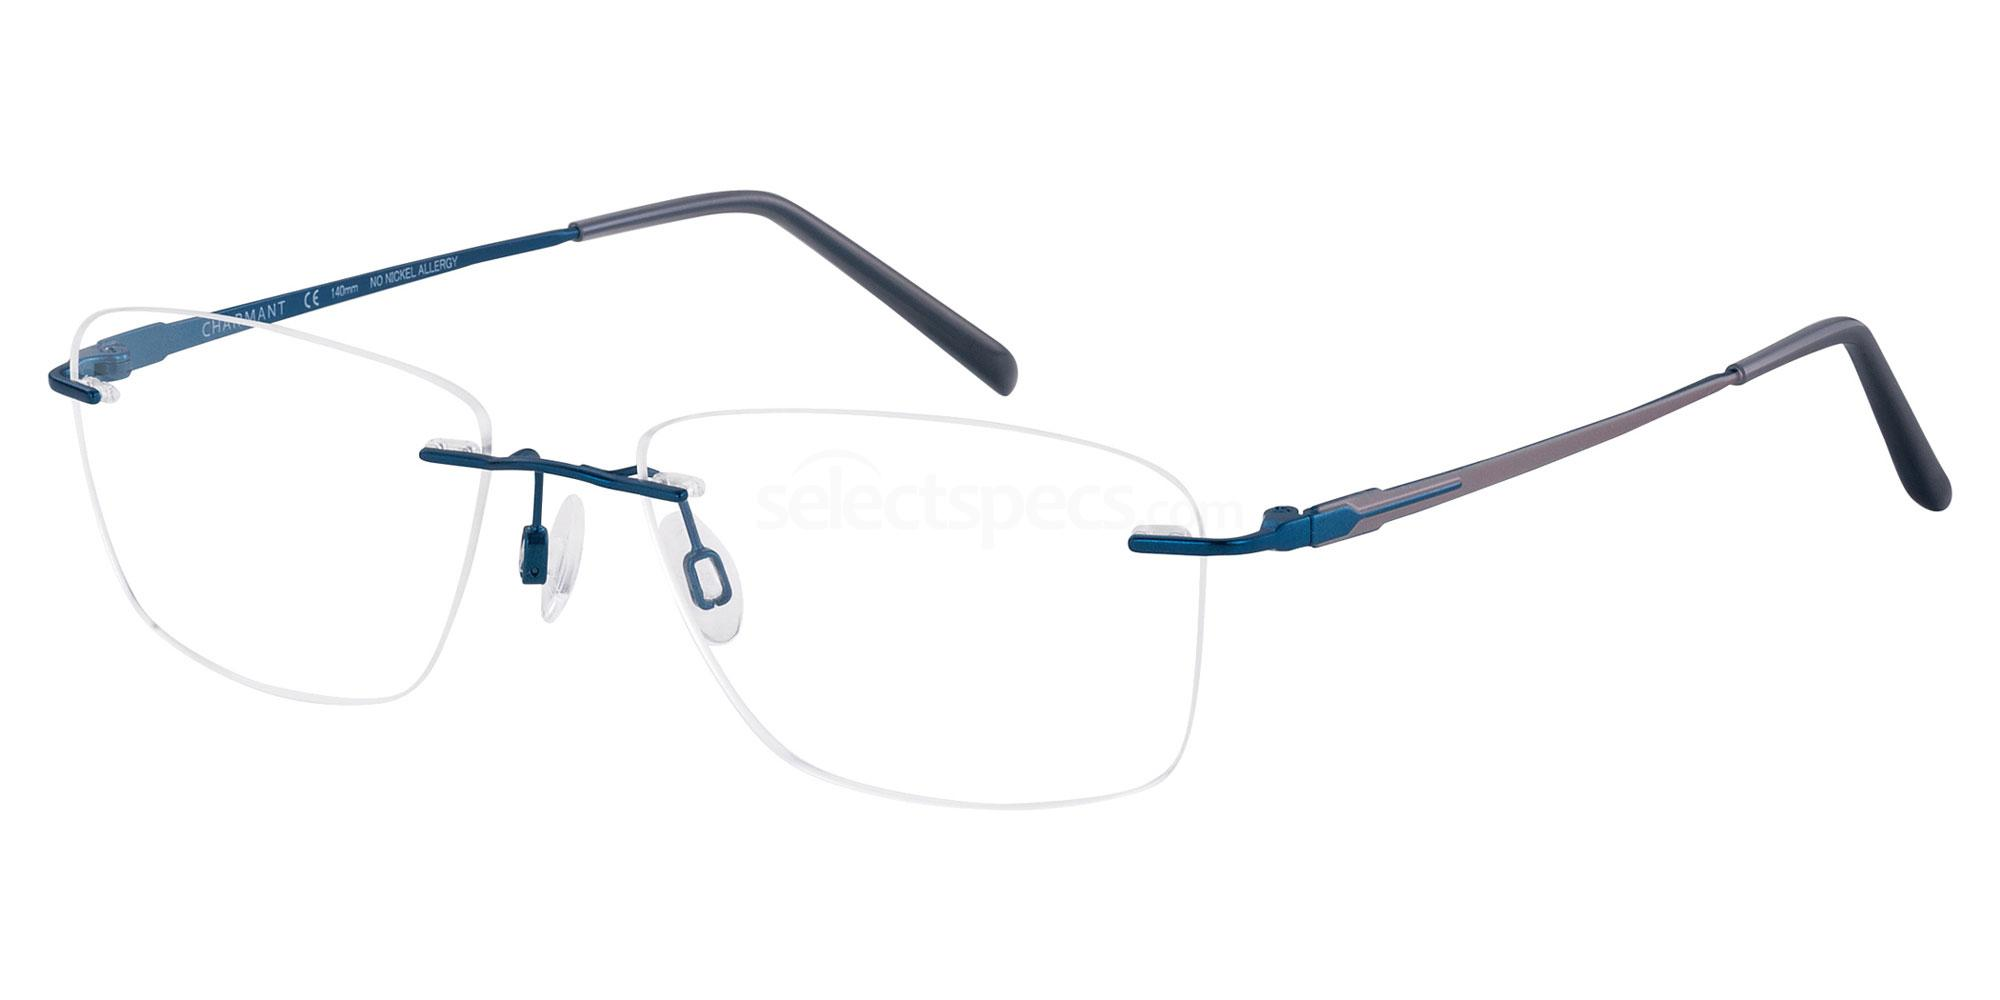 BL CH110976 Glasses, Charmant Titanium Perfection